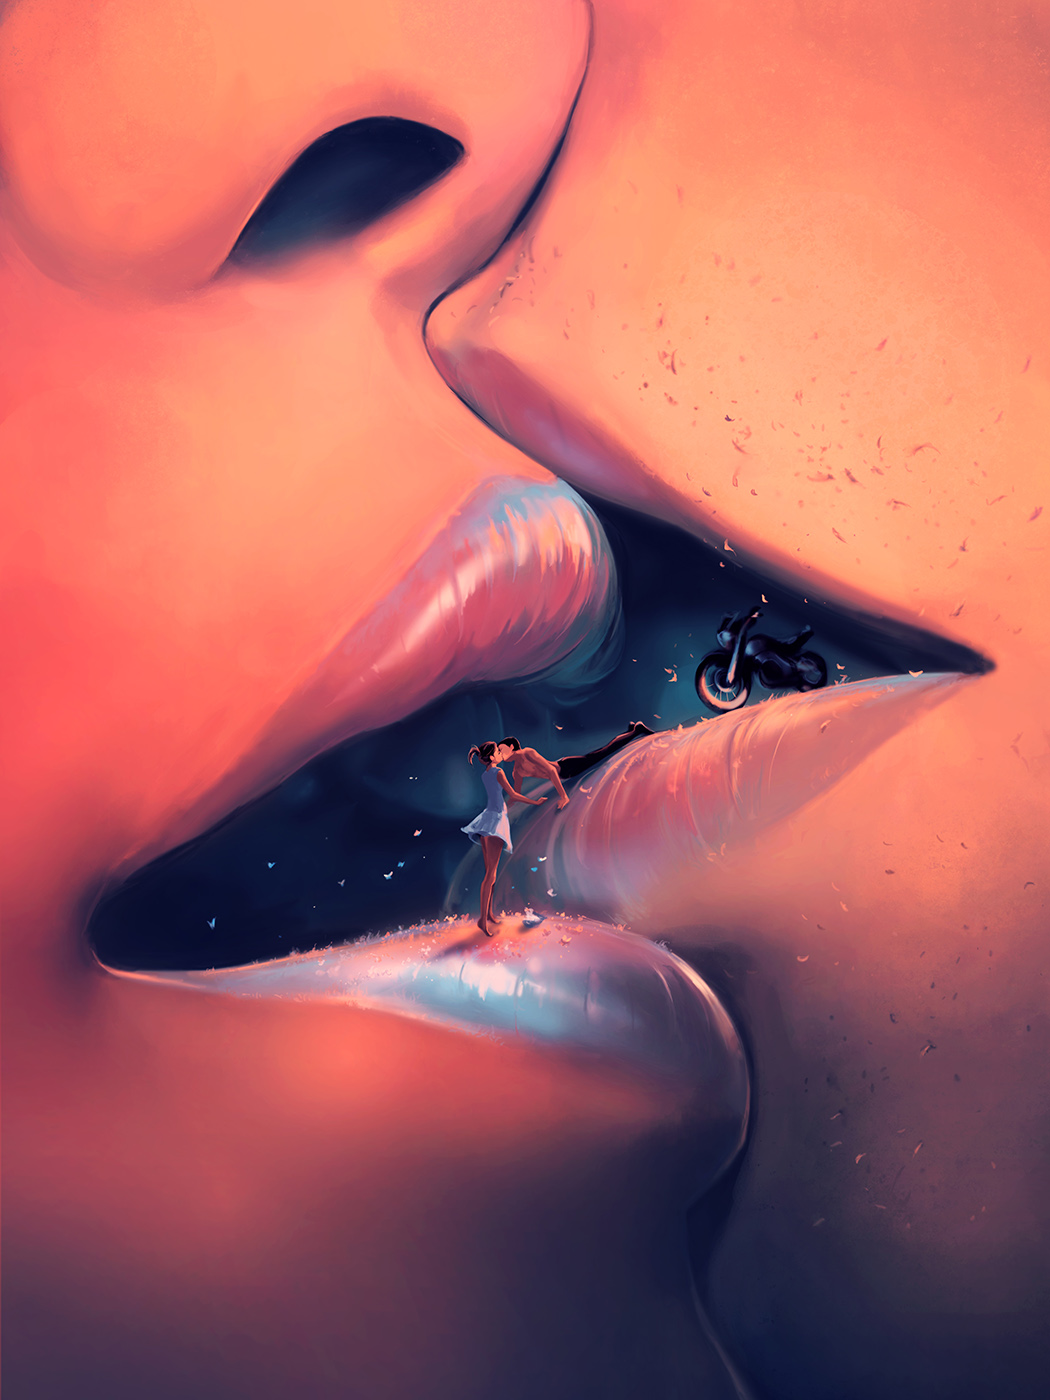 Meet me halfway by AquaSixio